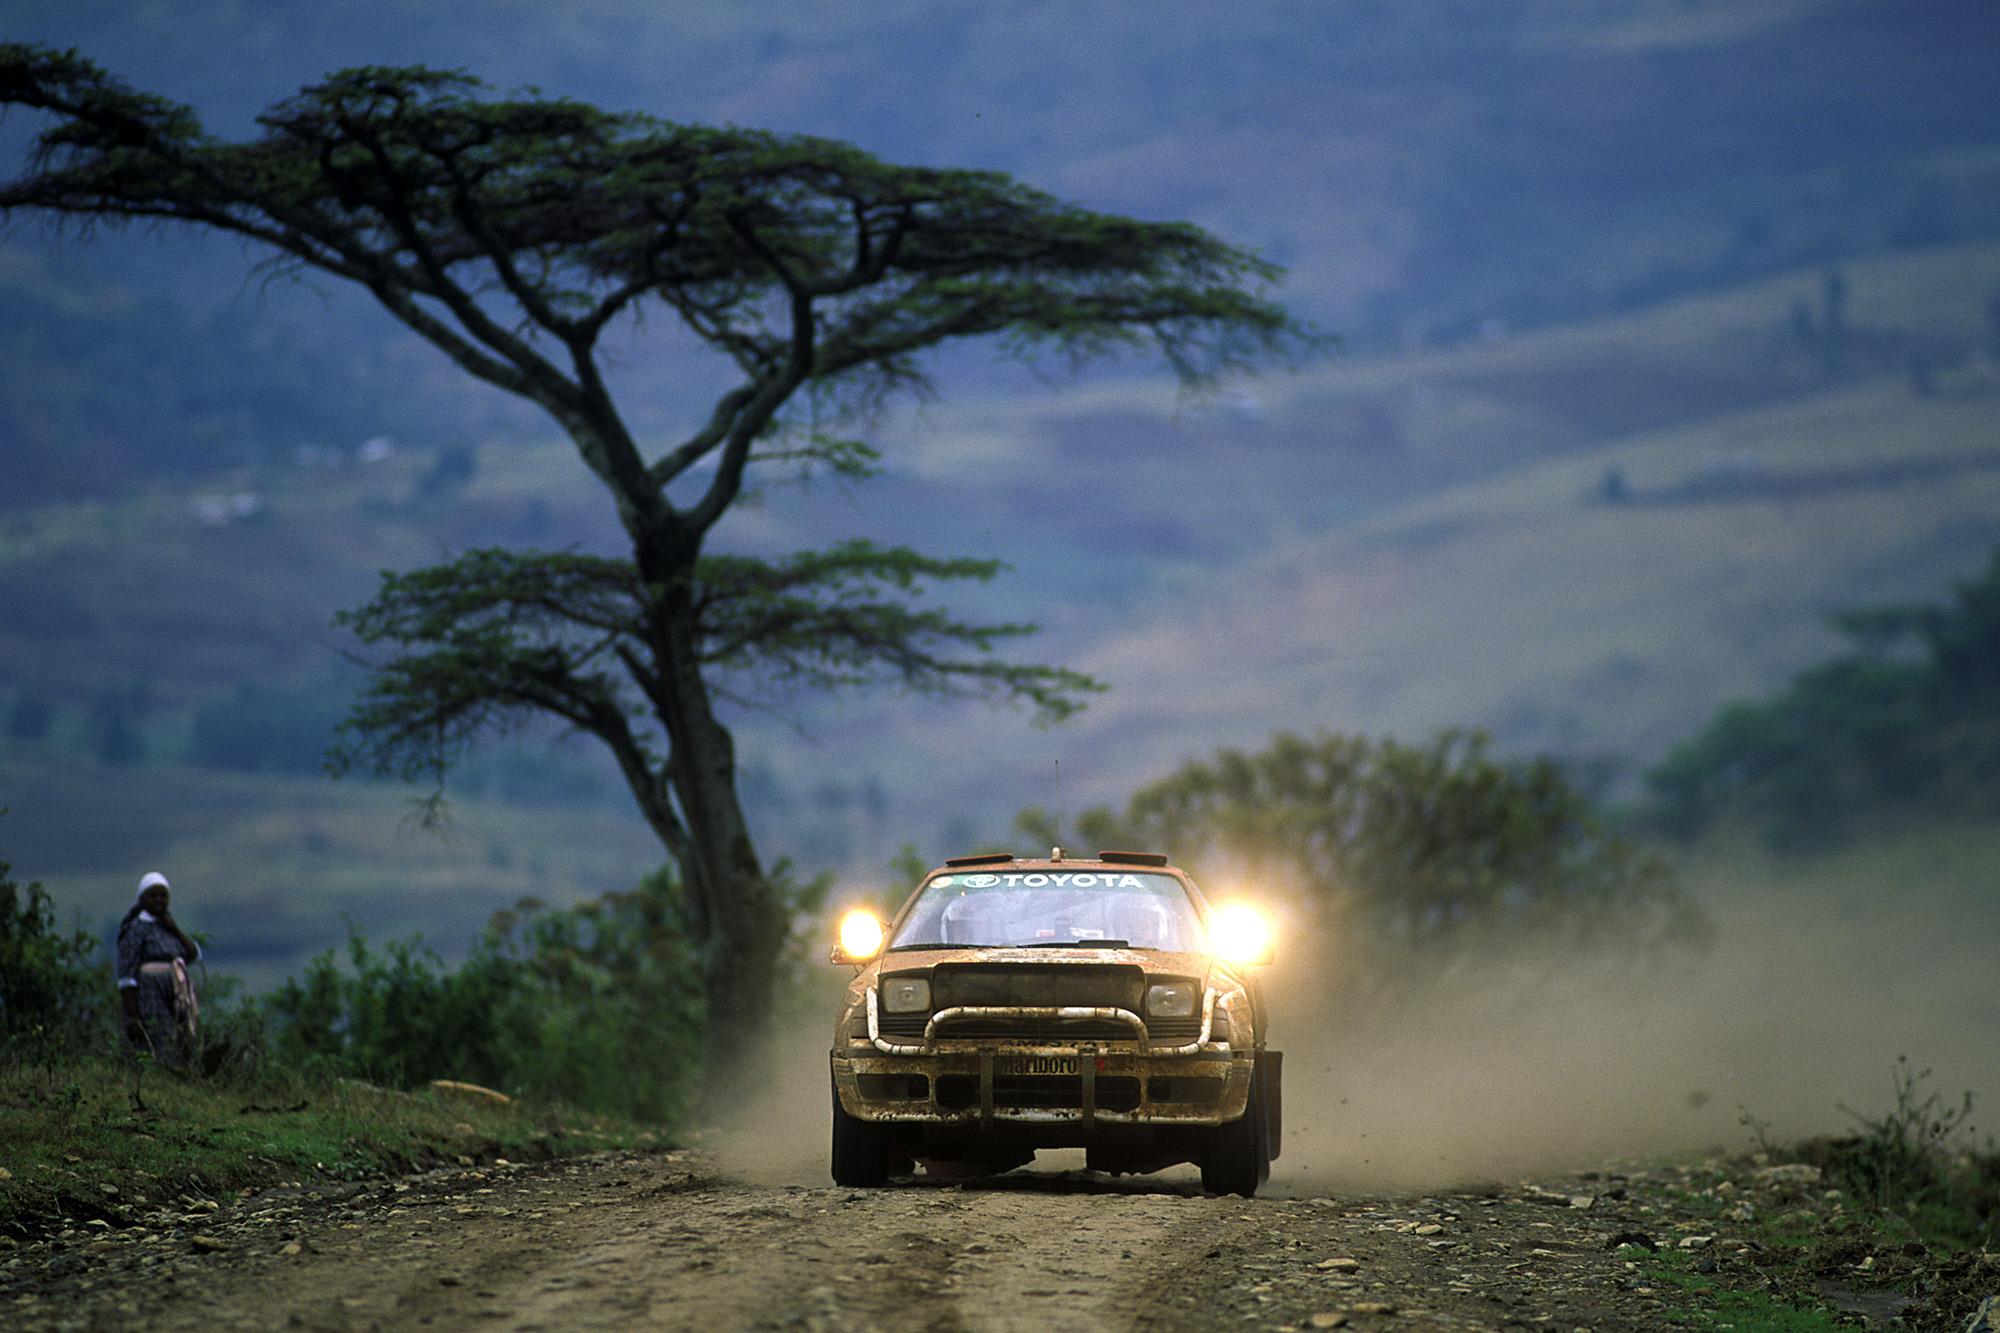 WRC: Safari Rally Kenya [23-27 Junio] - Página 2 E4eYyP5WYAYL11T?format=jpg&name=large